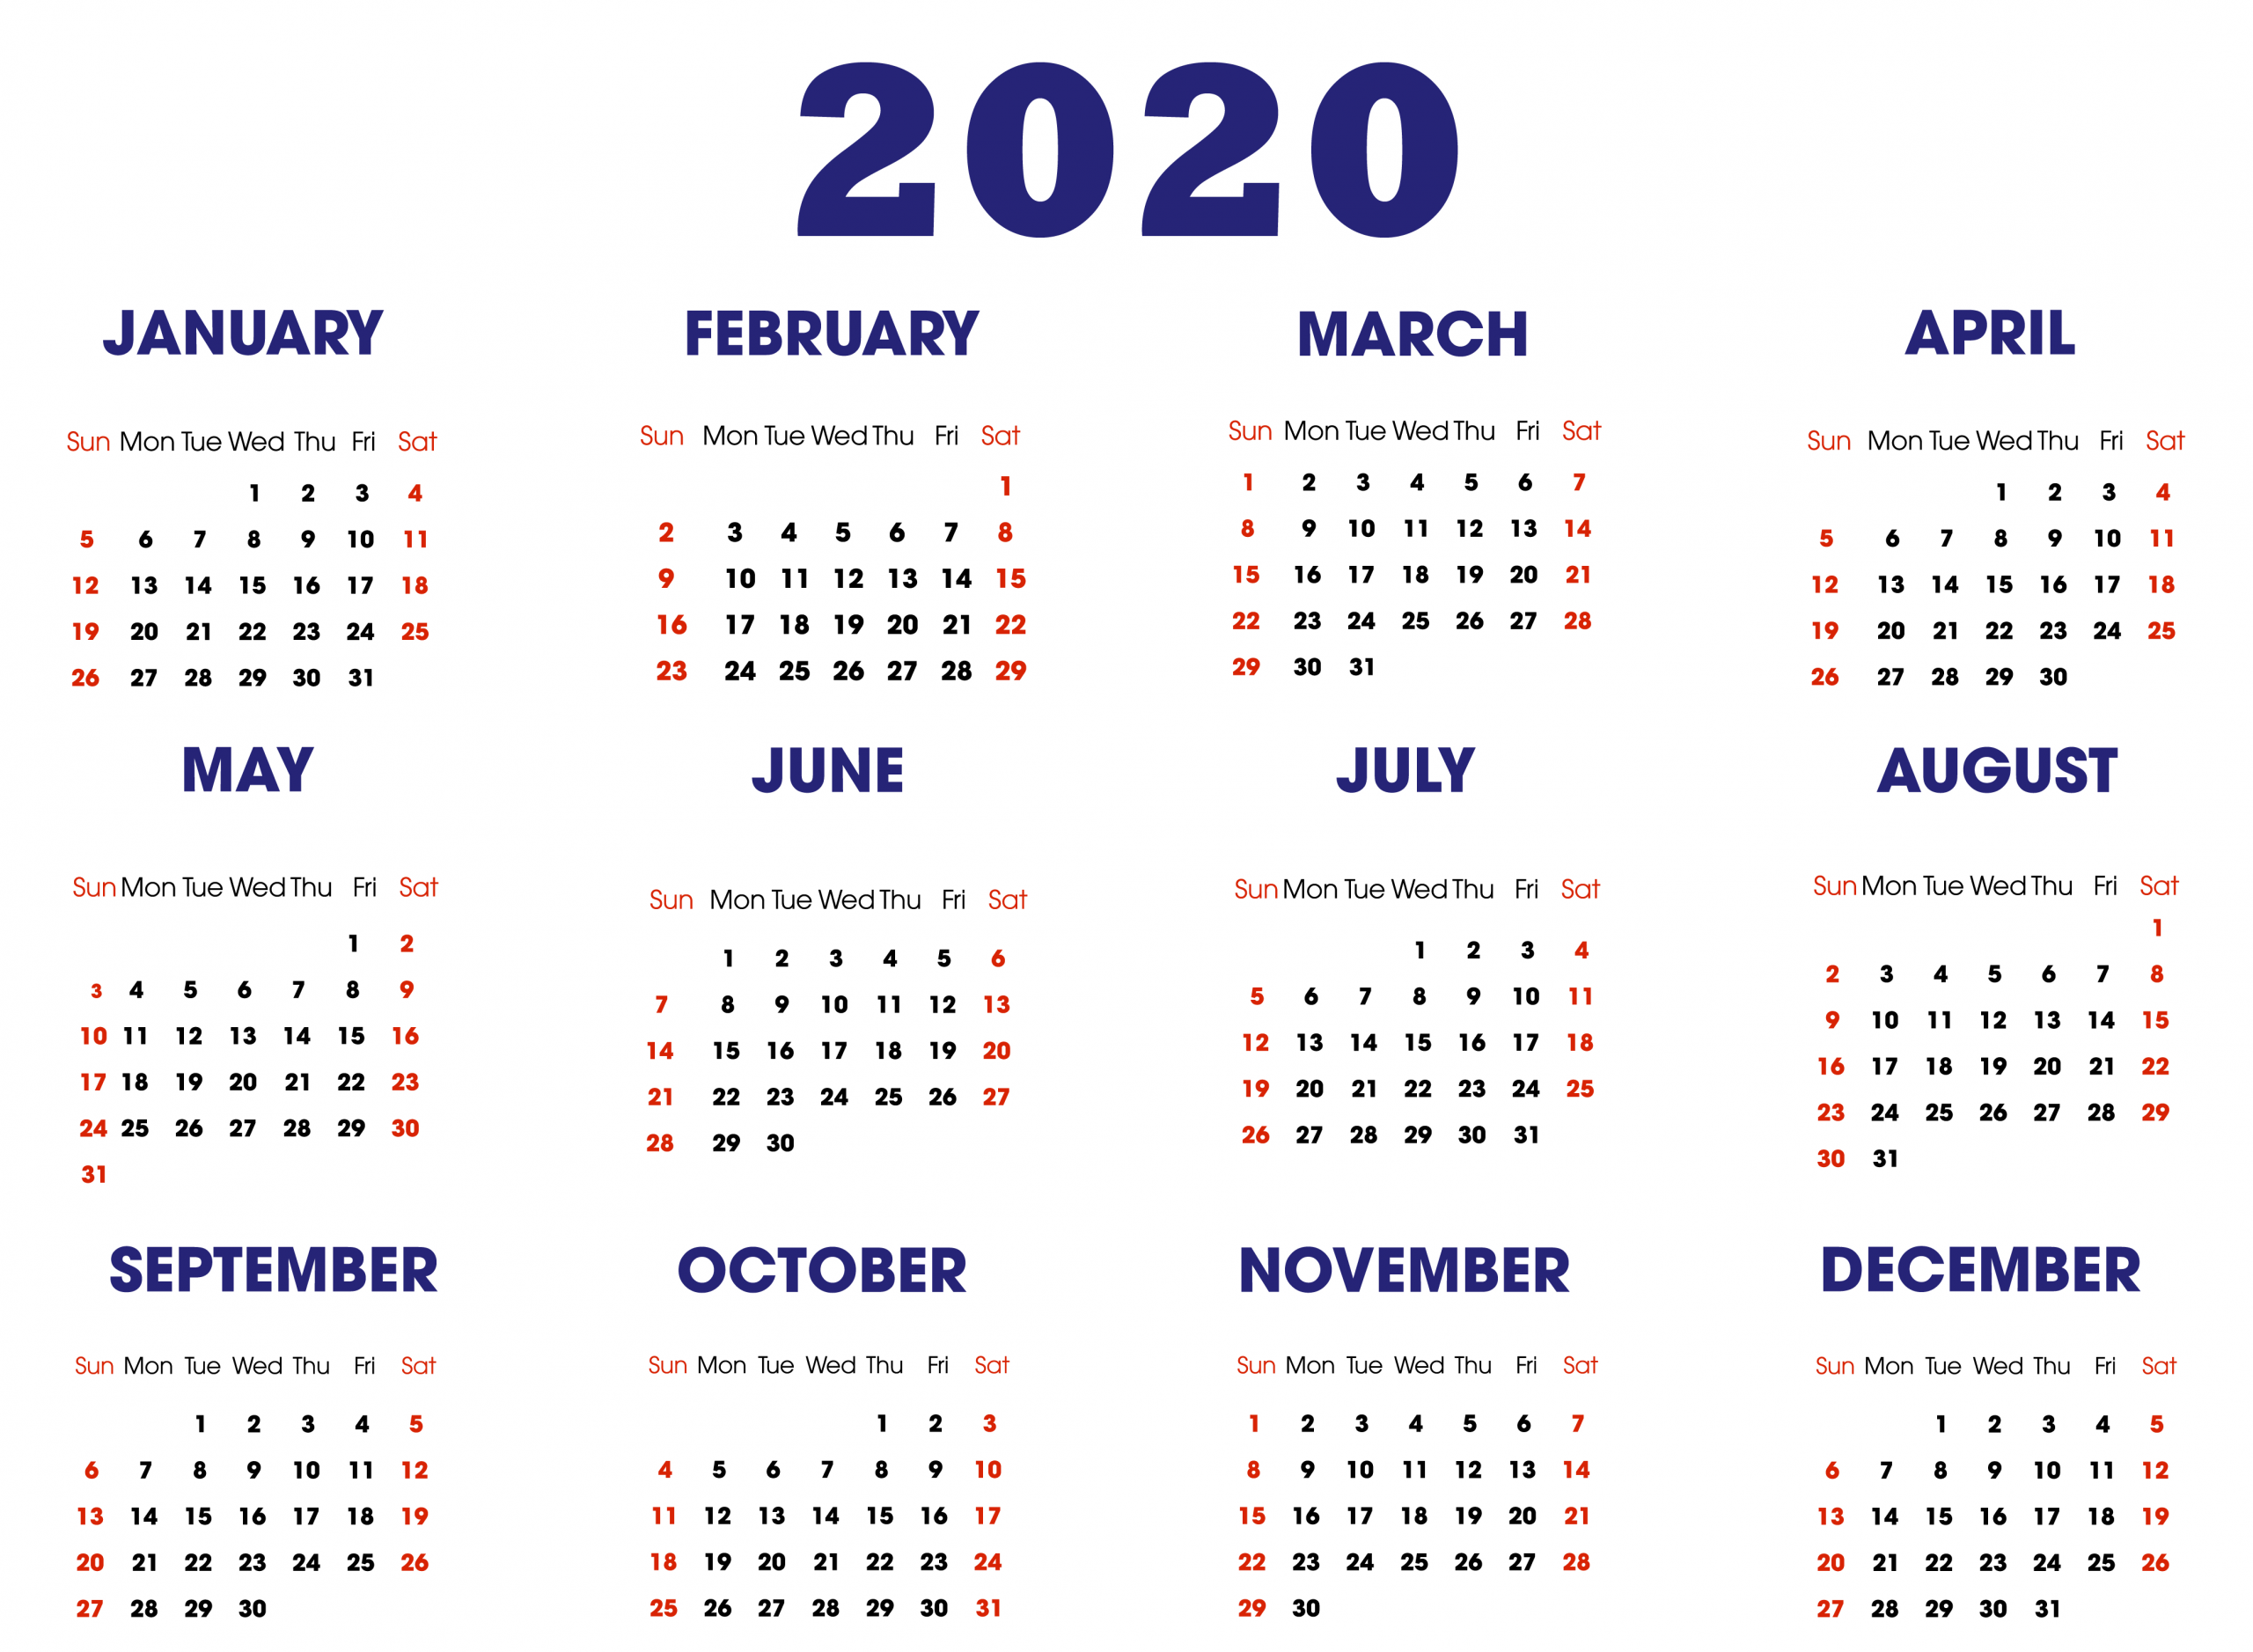 2020 Calendar Template | 2020 Calendar Template, Yearly